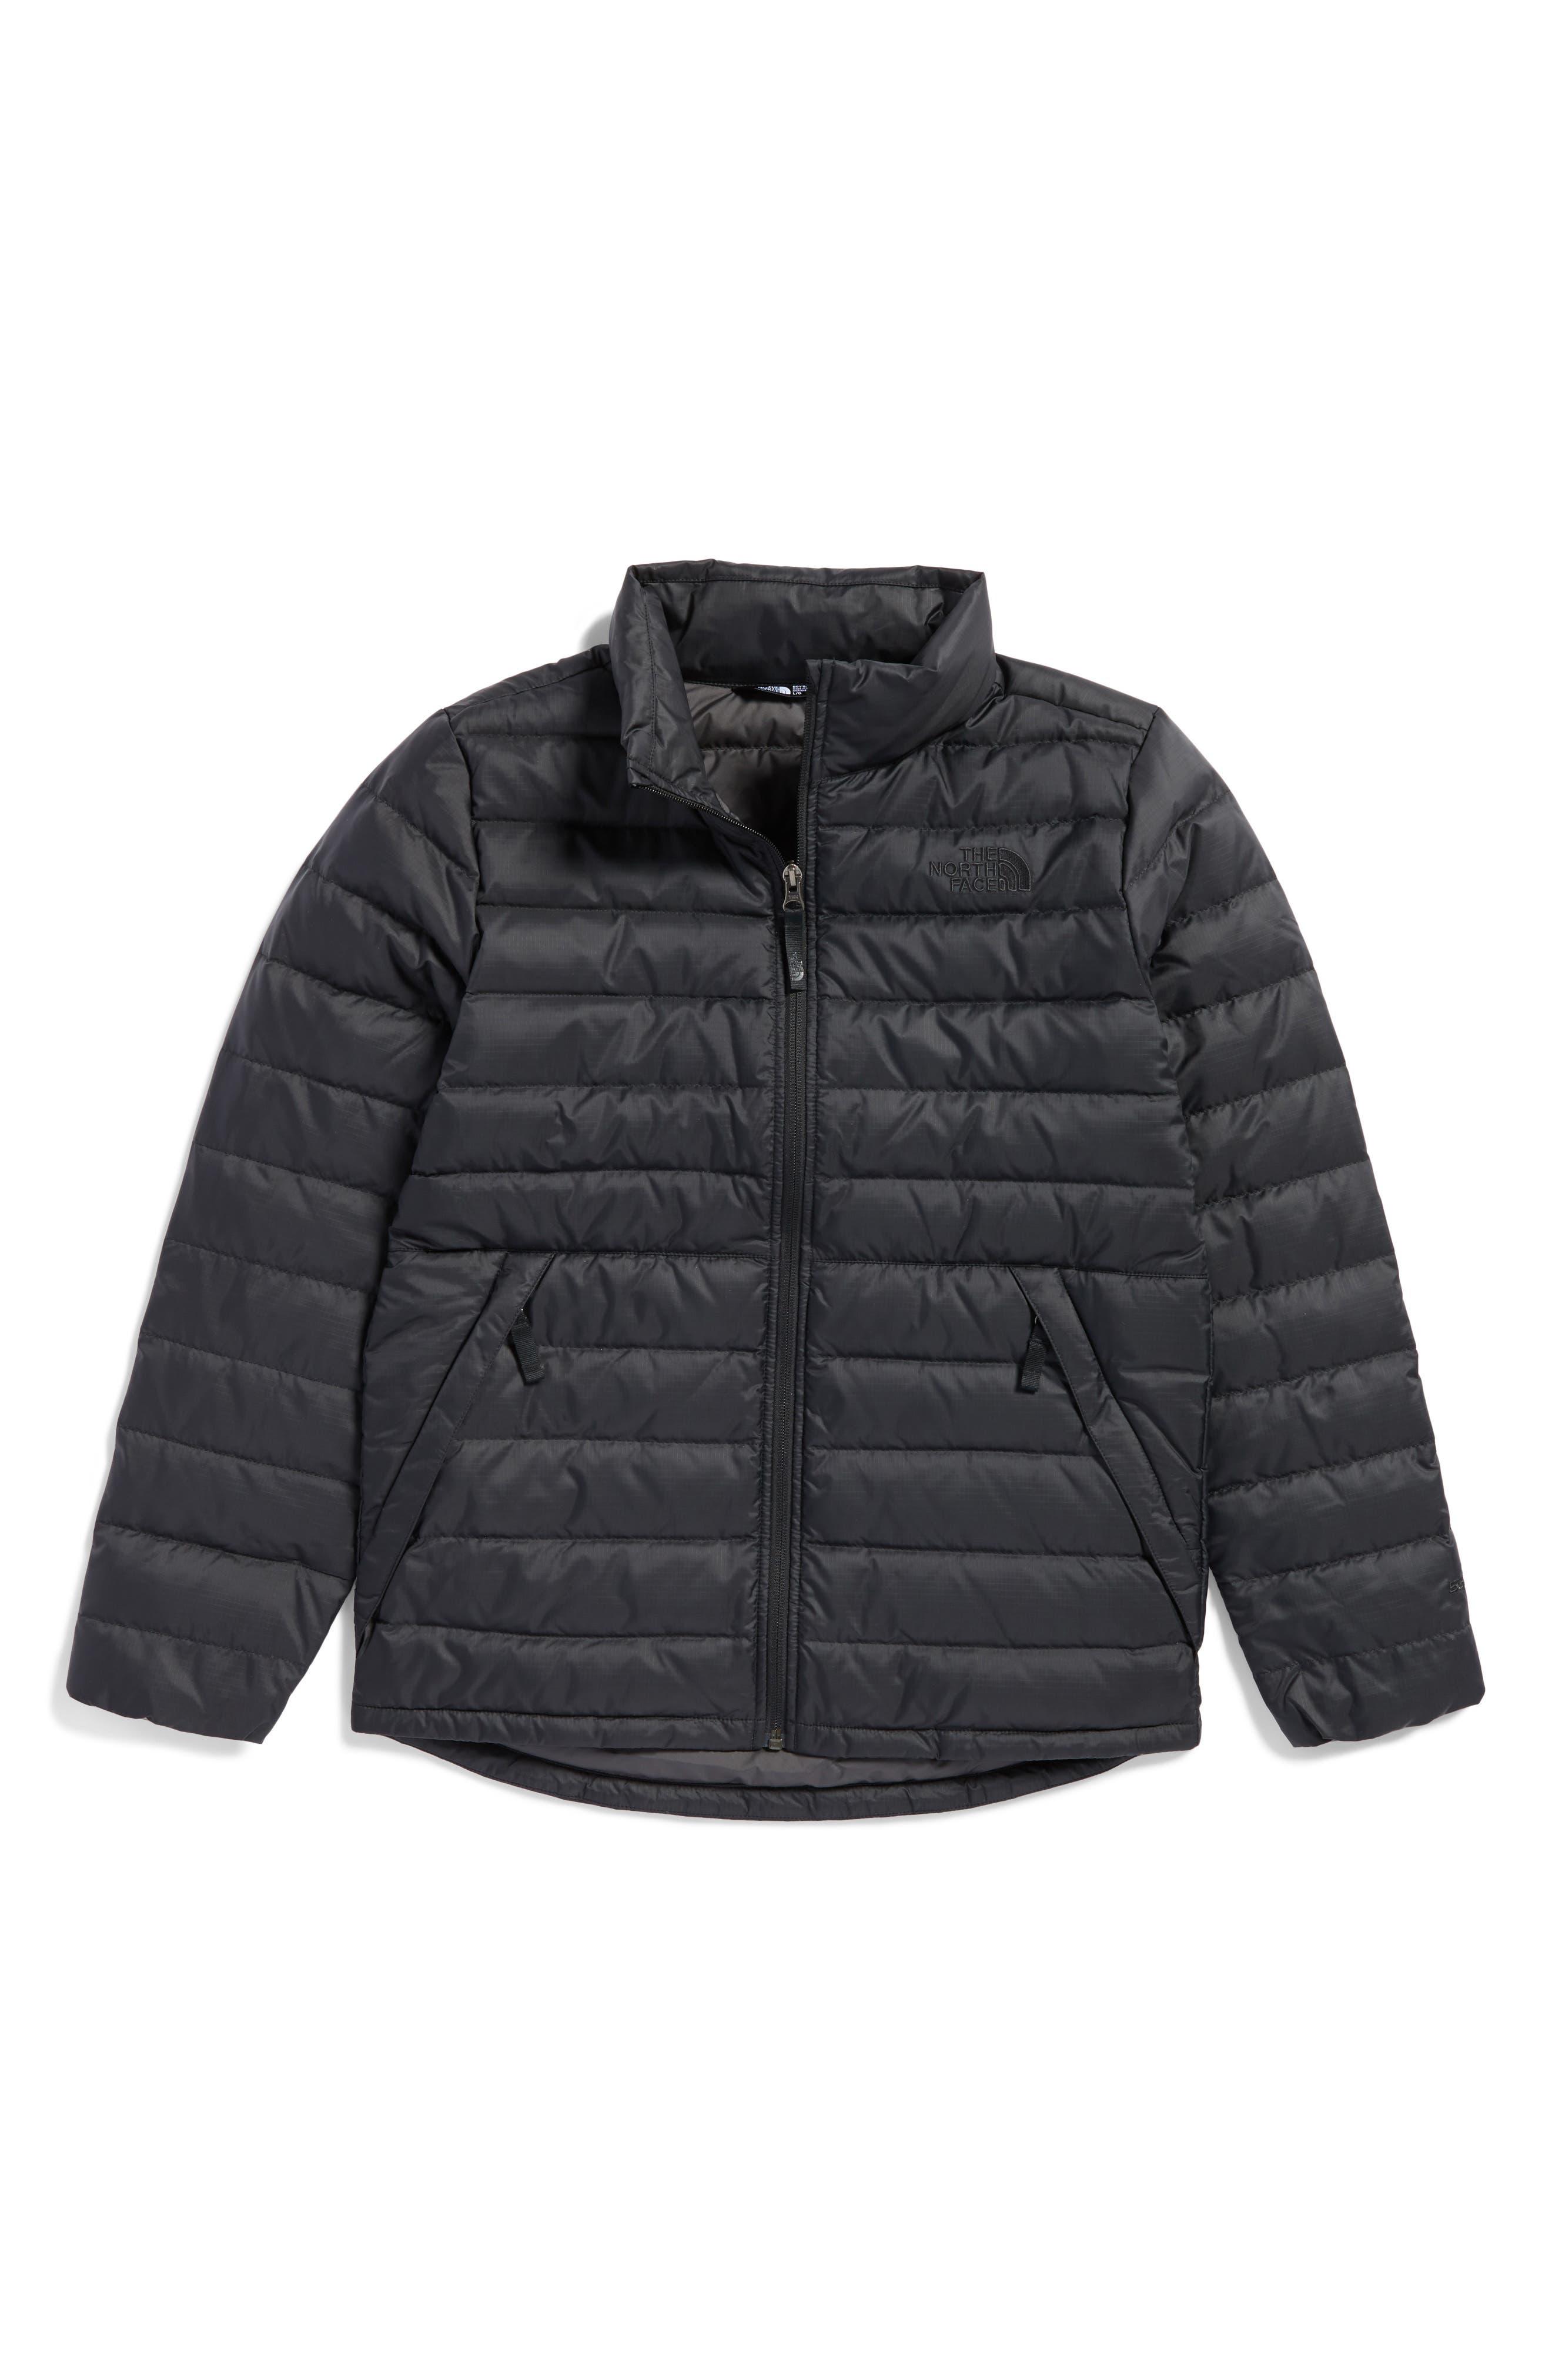 Aconcagua 550-Fill Power Down Jacket,                         Main,                         color, 001